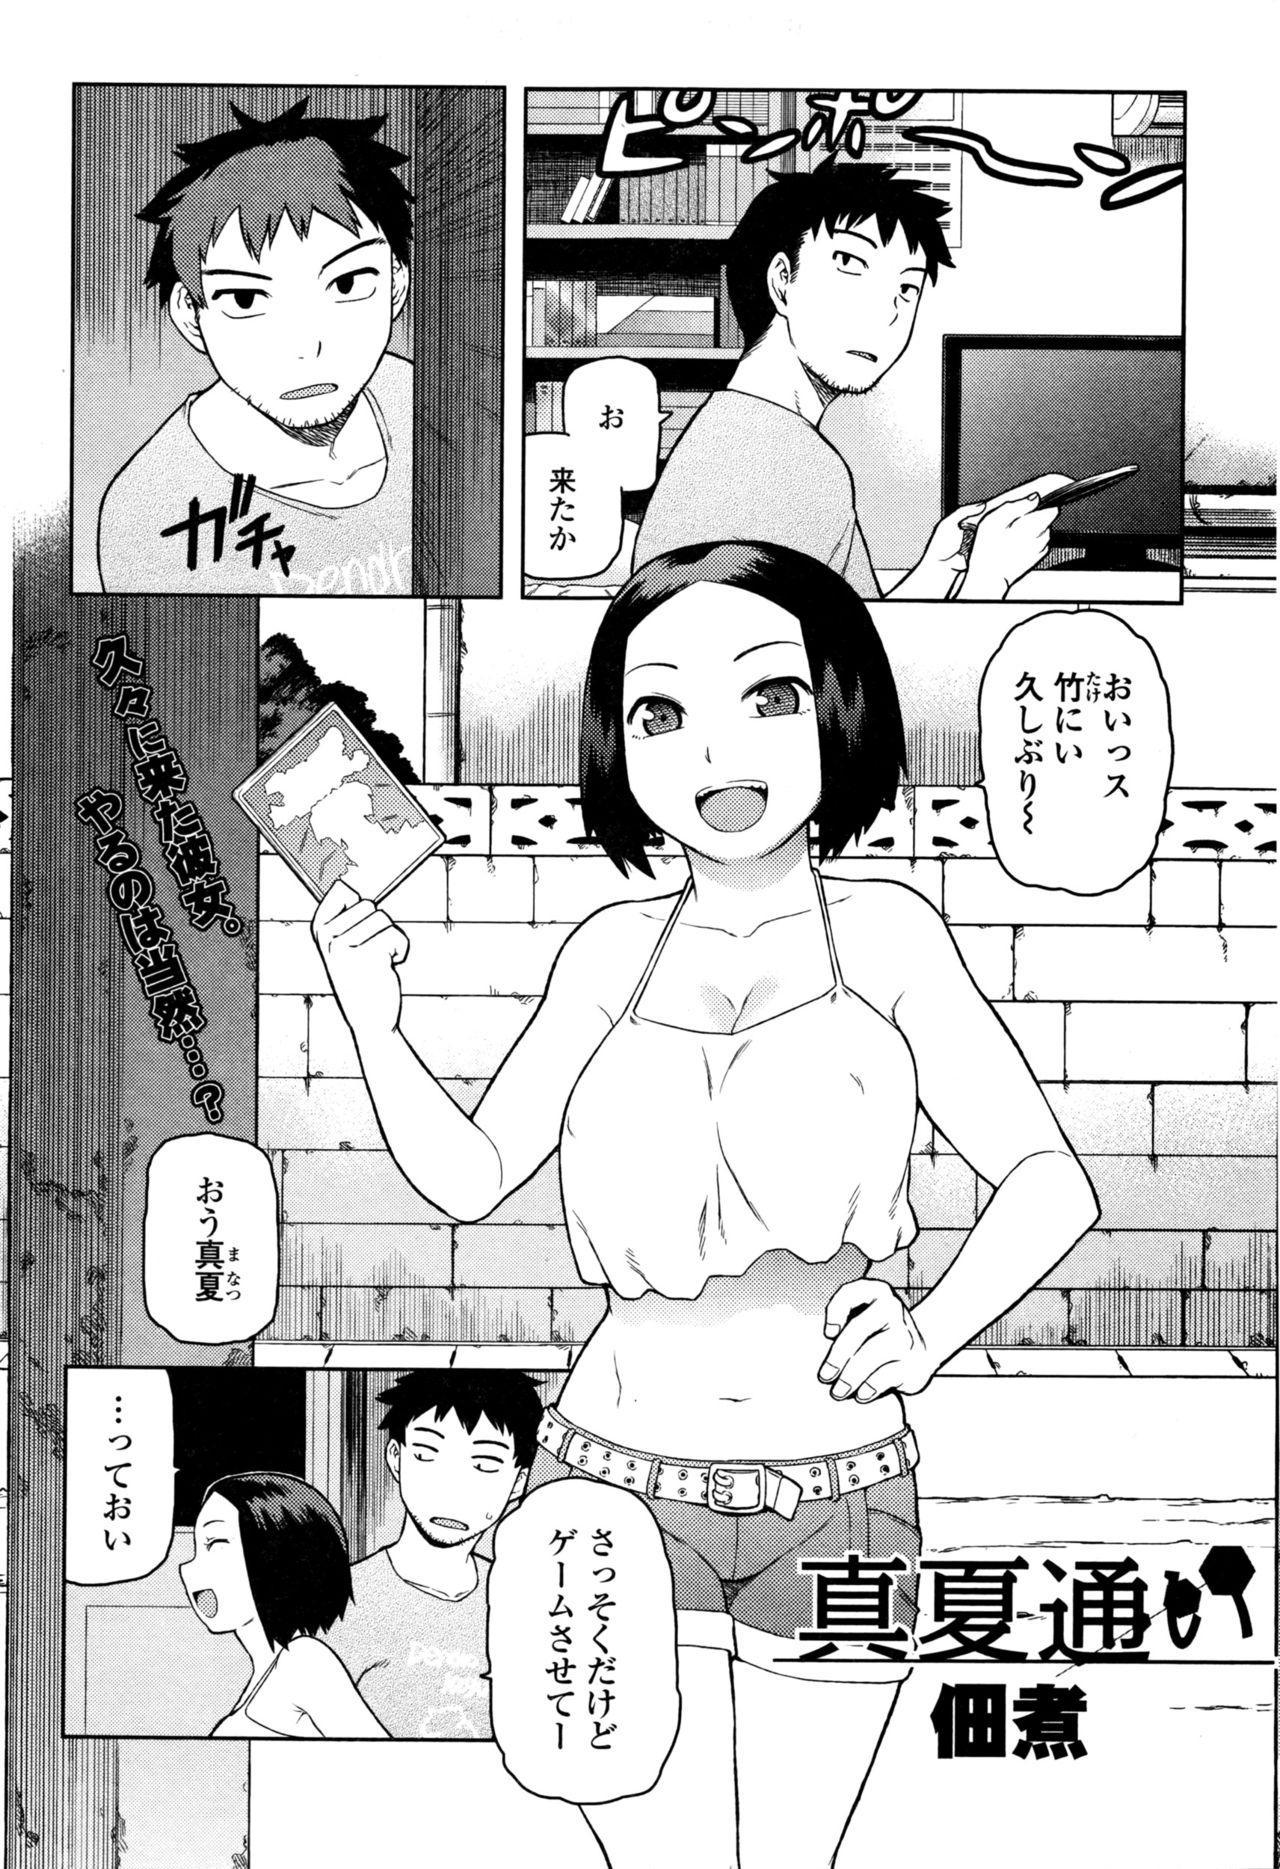 Comic JSCK Vol.4 2016-05 235